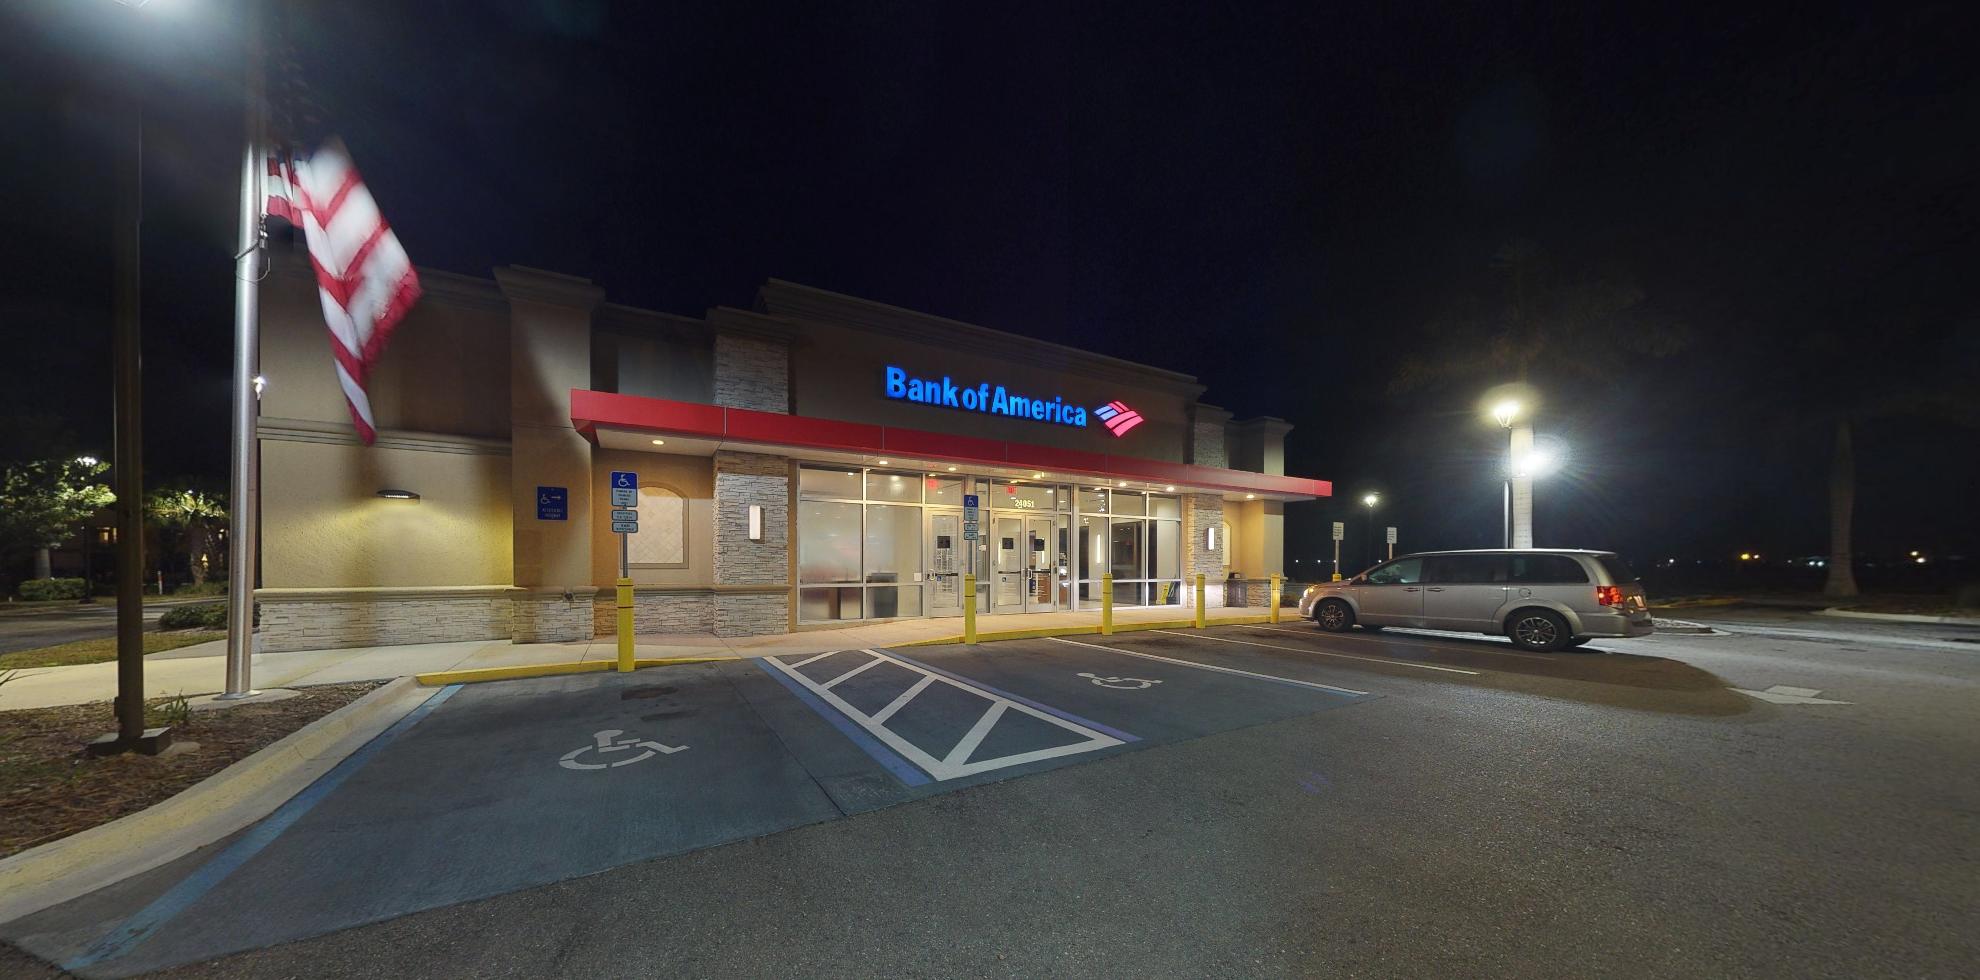 Bank of America financial center with drive-thru ATM | 24051 Veterans Blvd, Port Charlotte, FL 33954